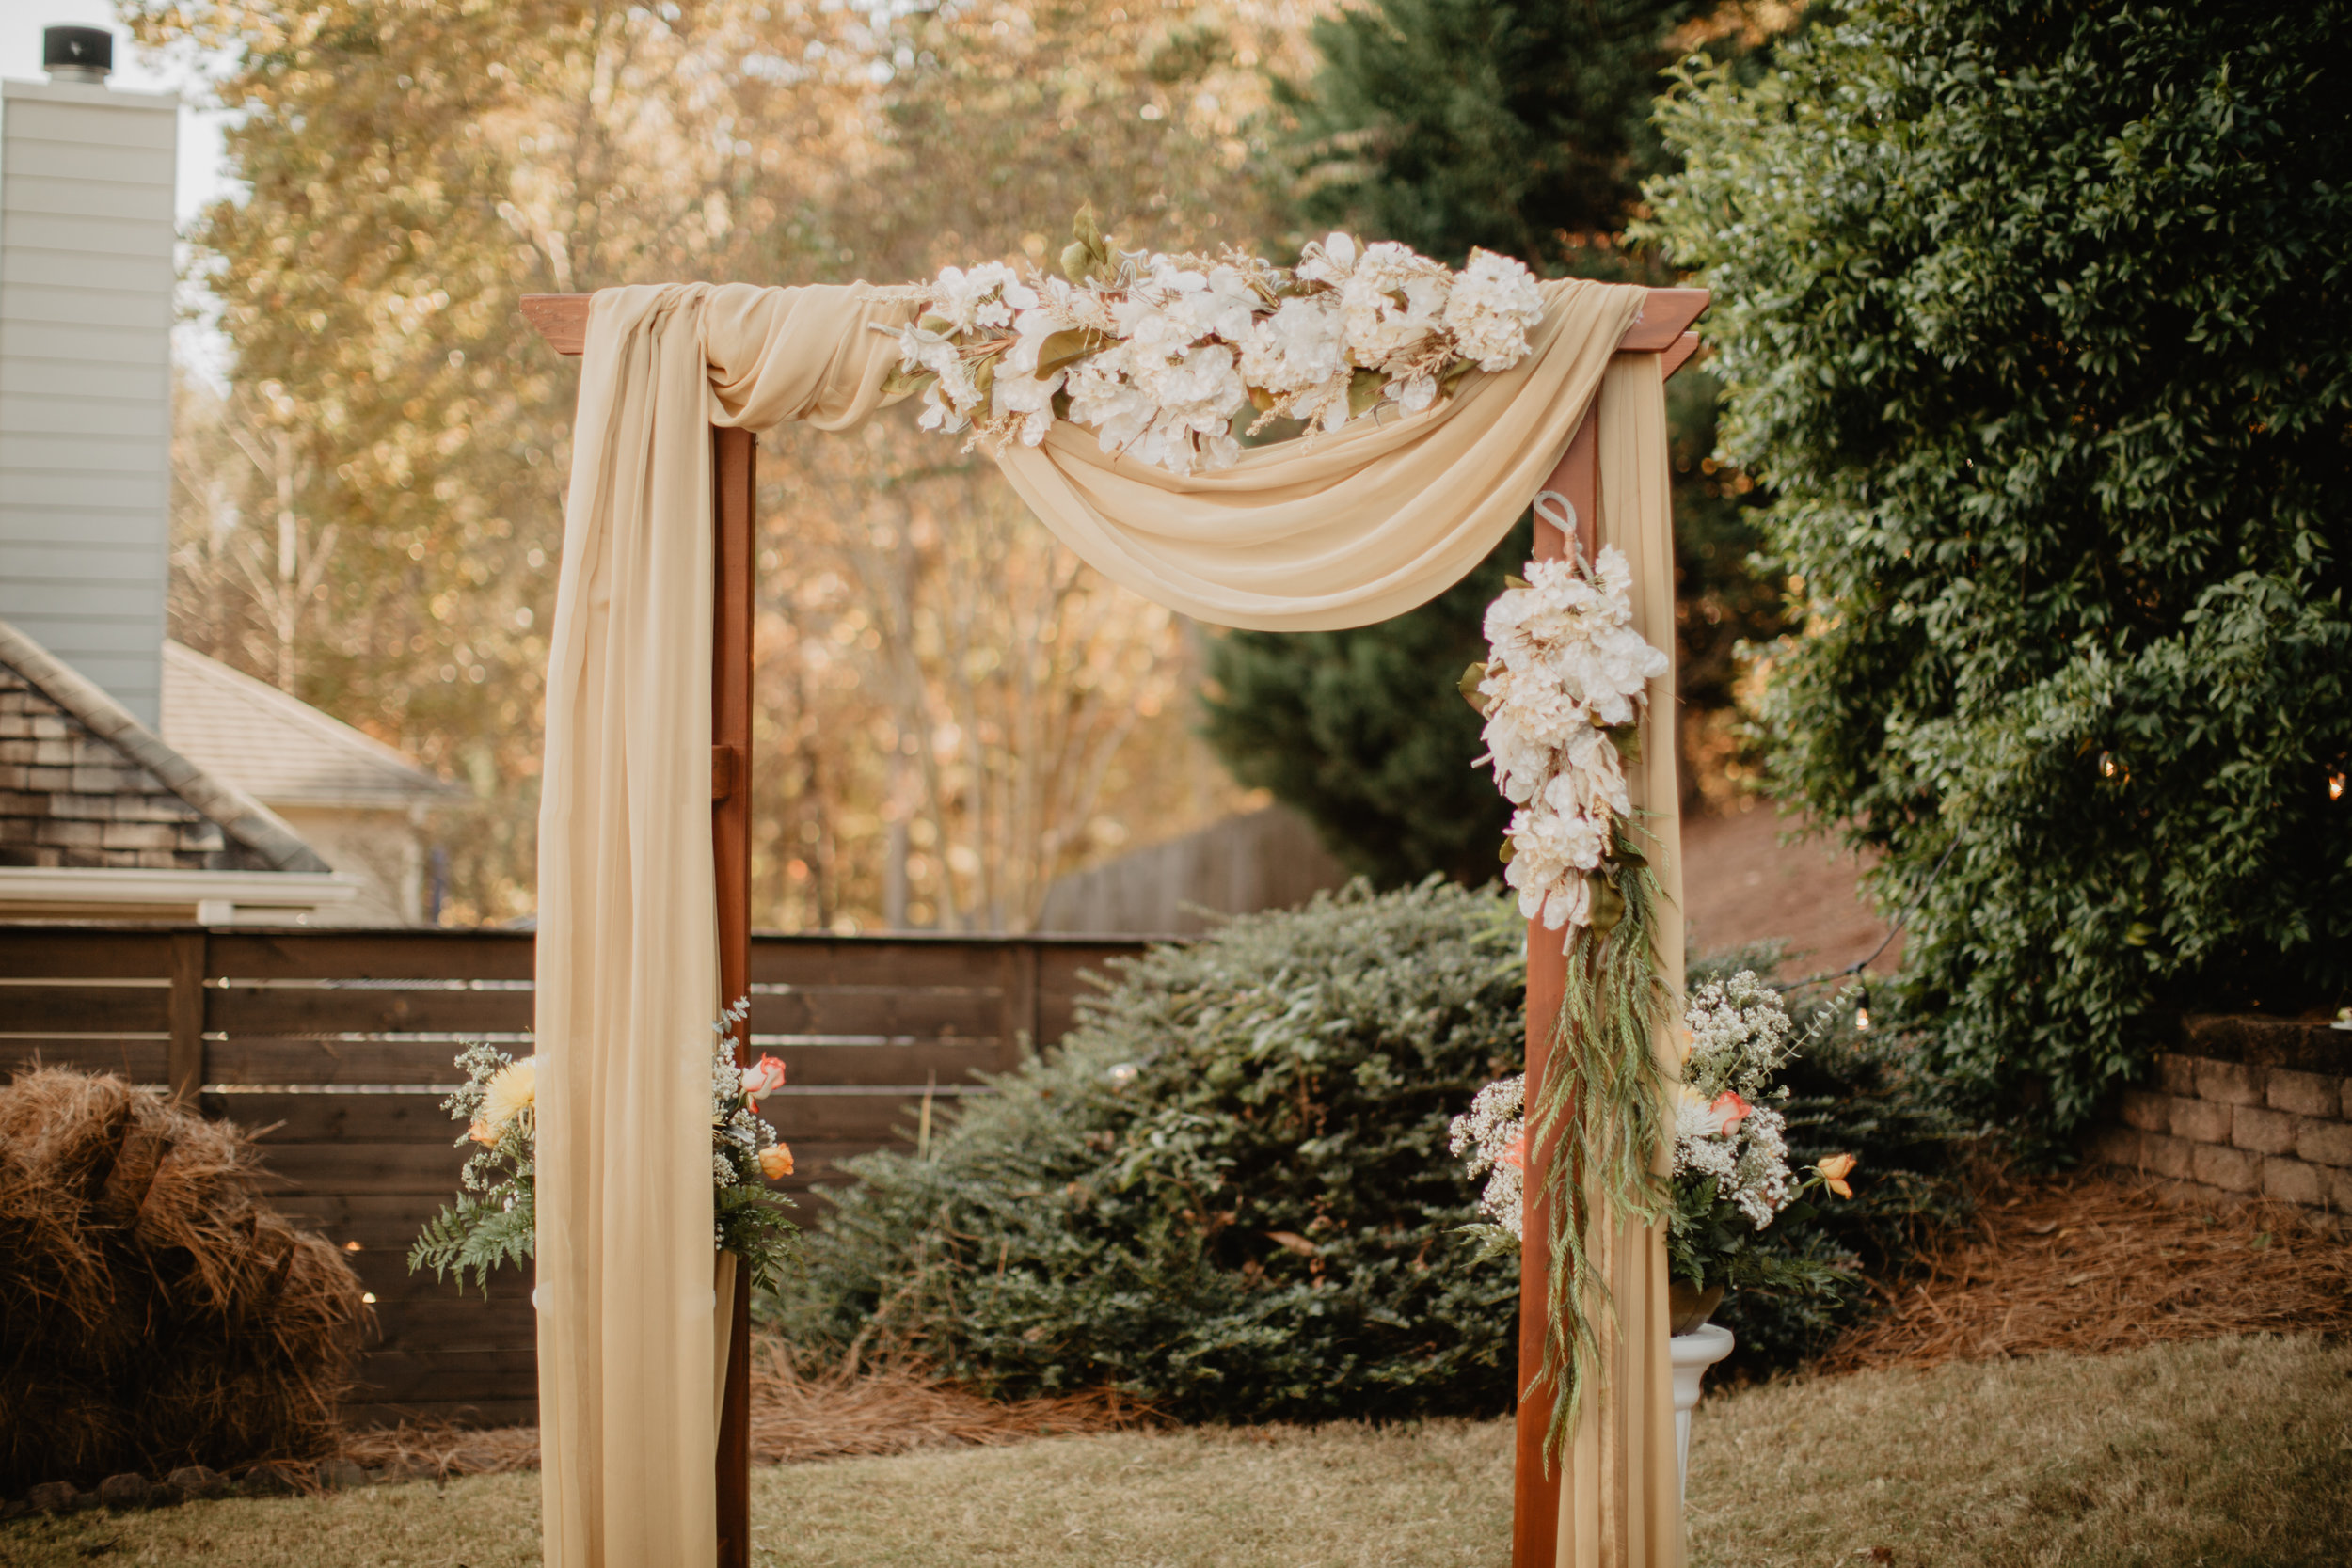 In Holy Matrimony -